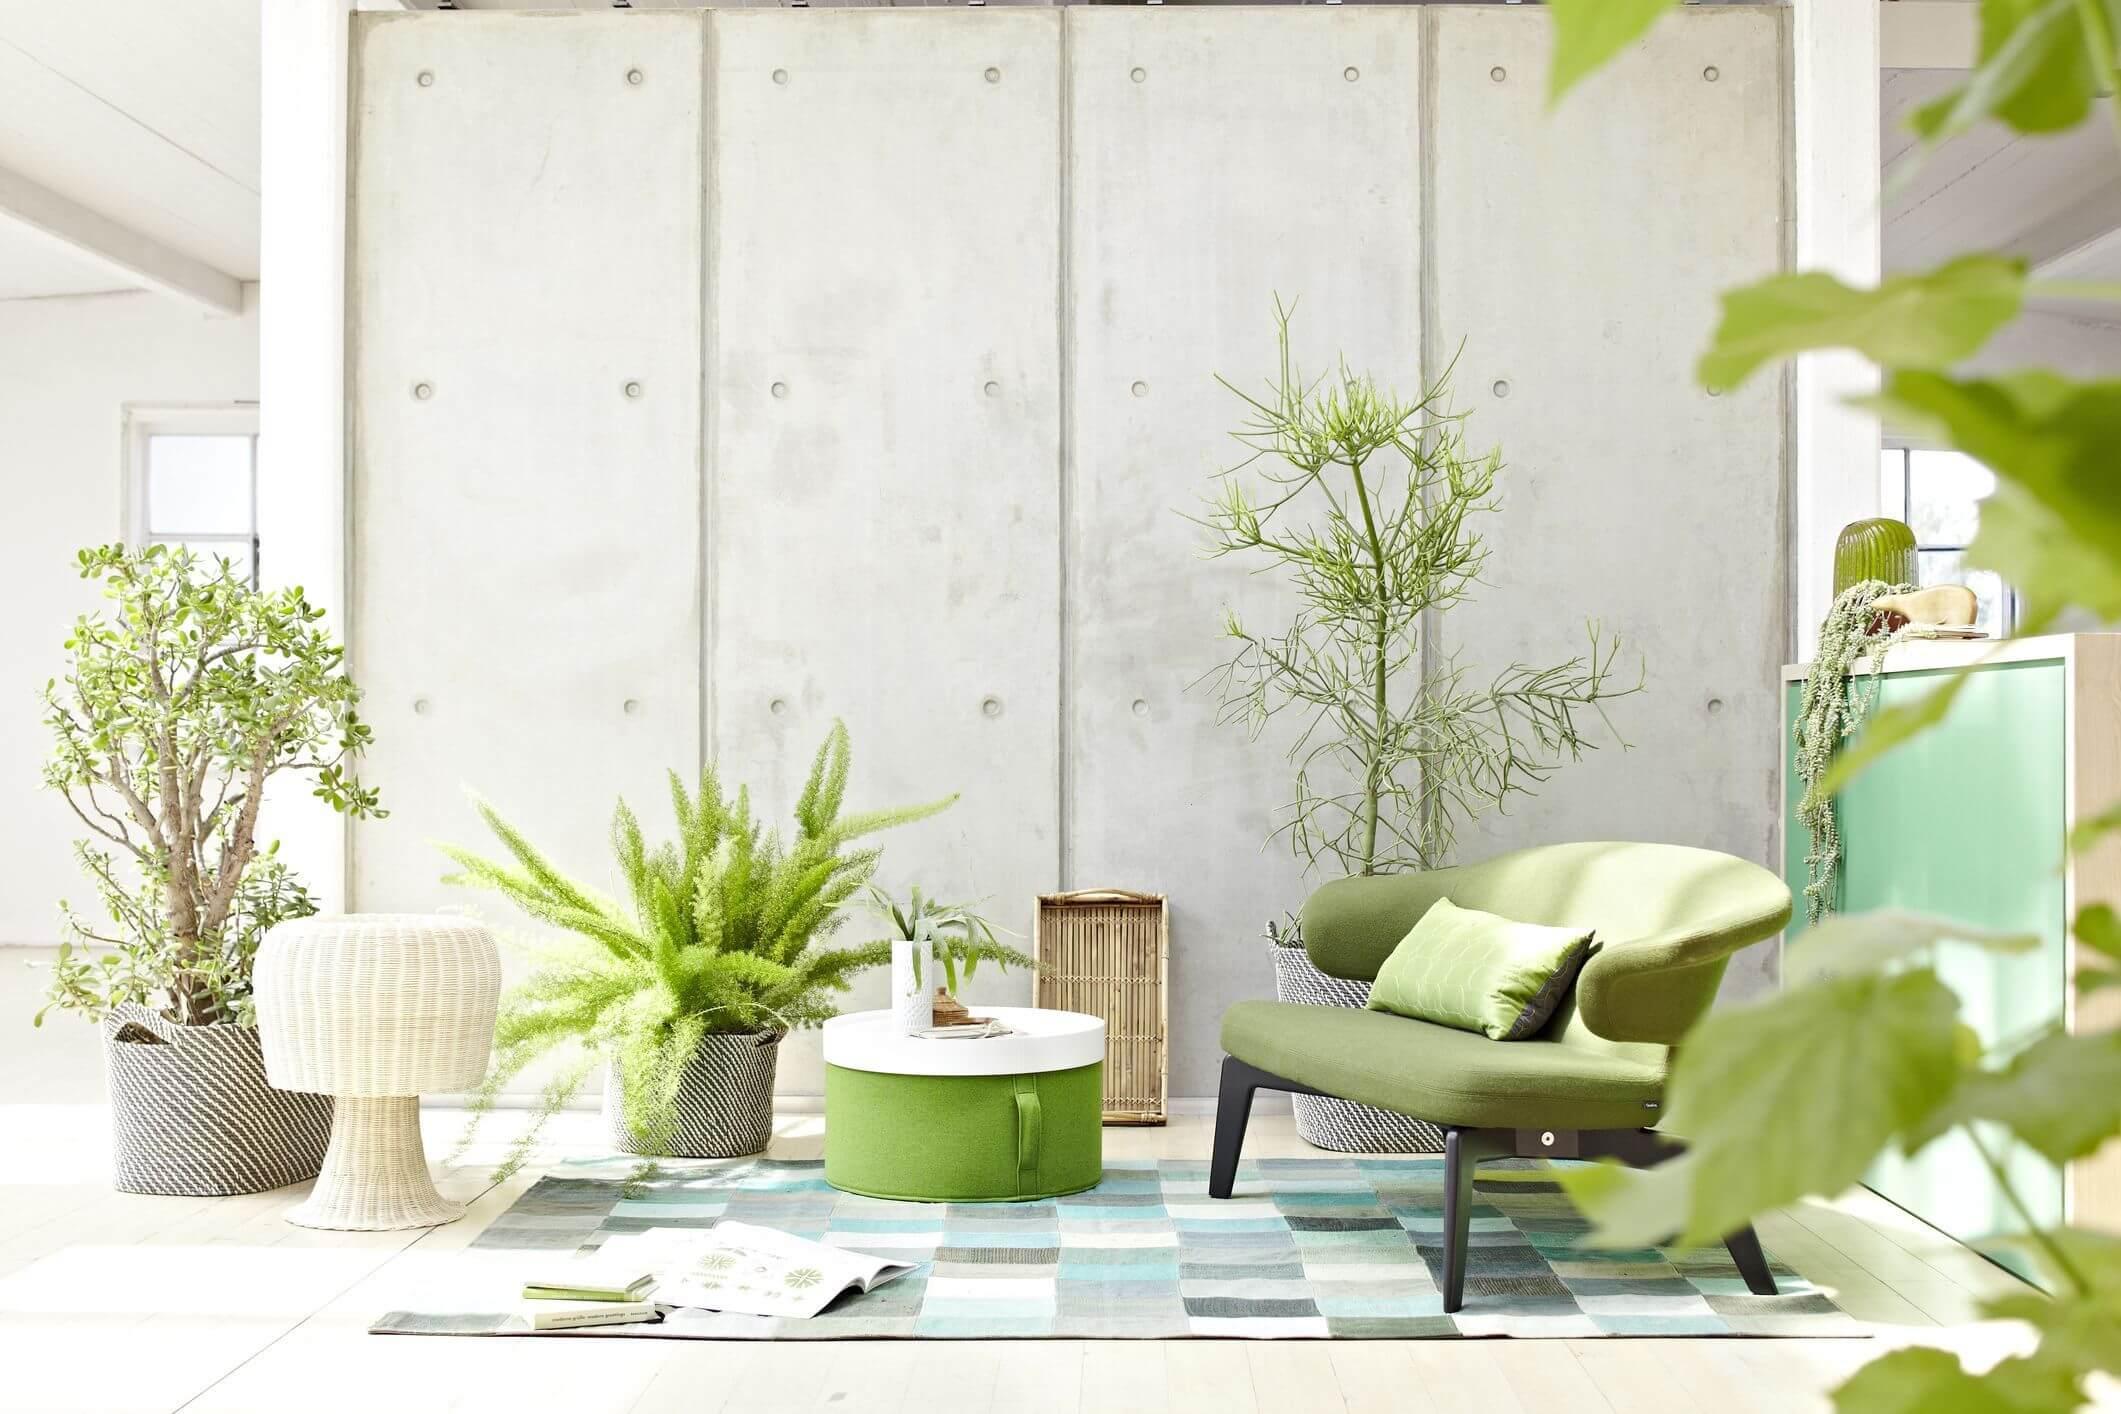 Geometric Green Wallpaper with Rattan Chair photo - 7